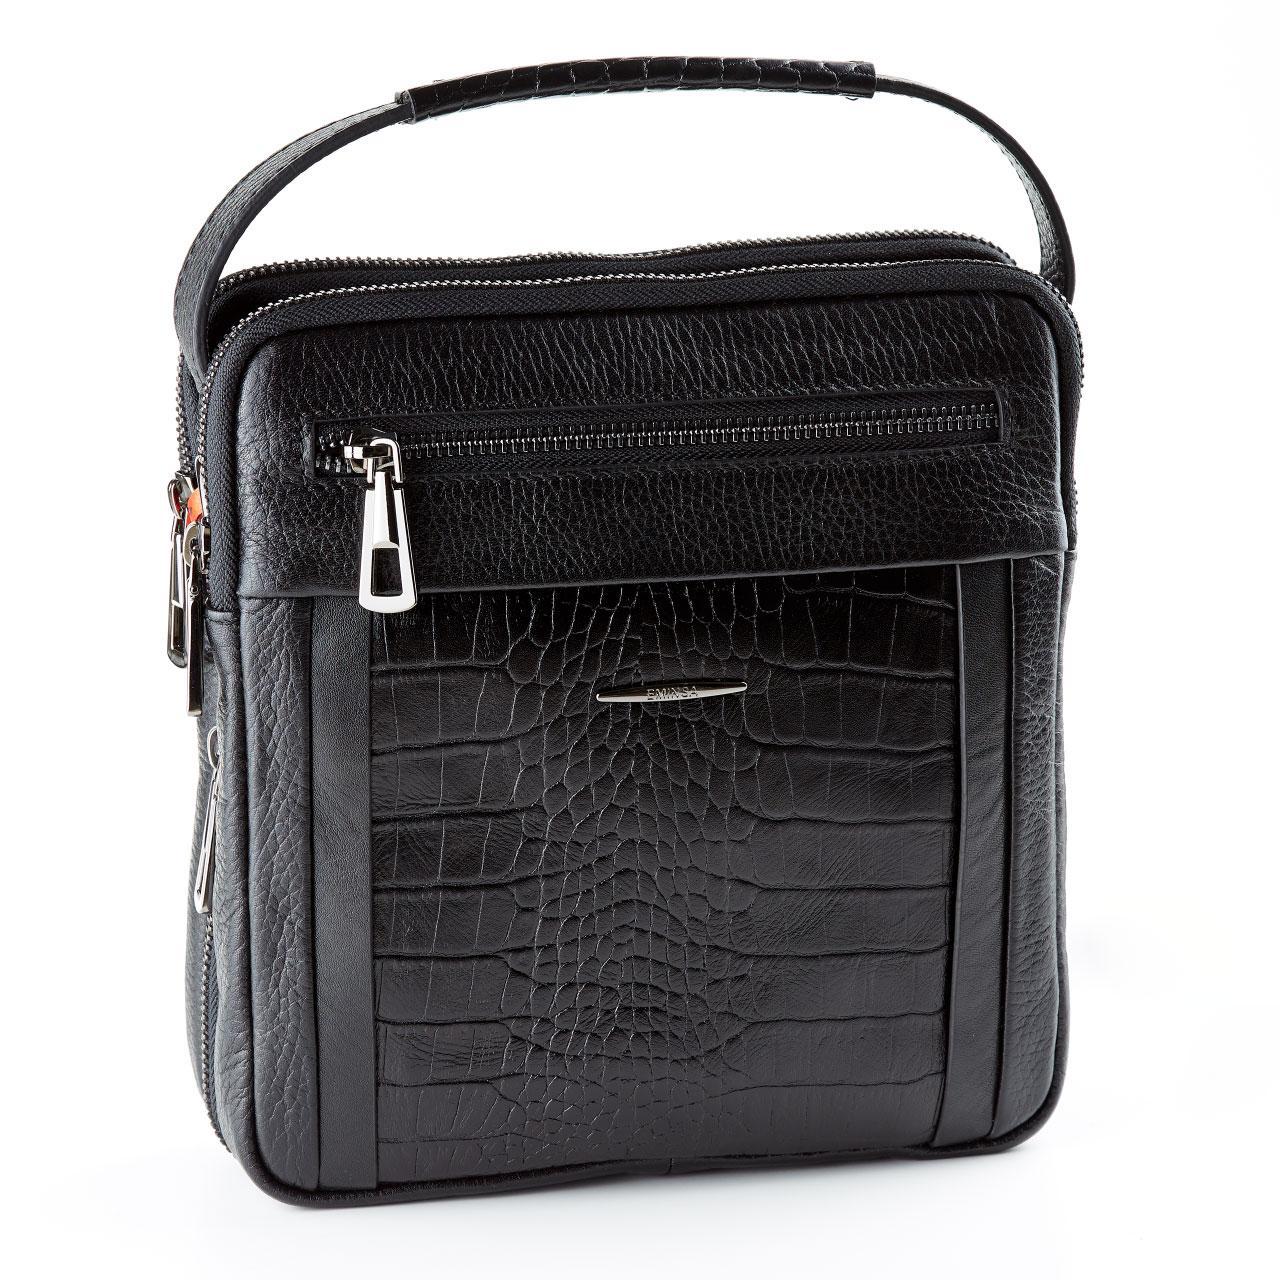 Мужская кожаная сумка черная Eminsa 6136-37-1